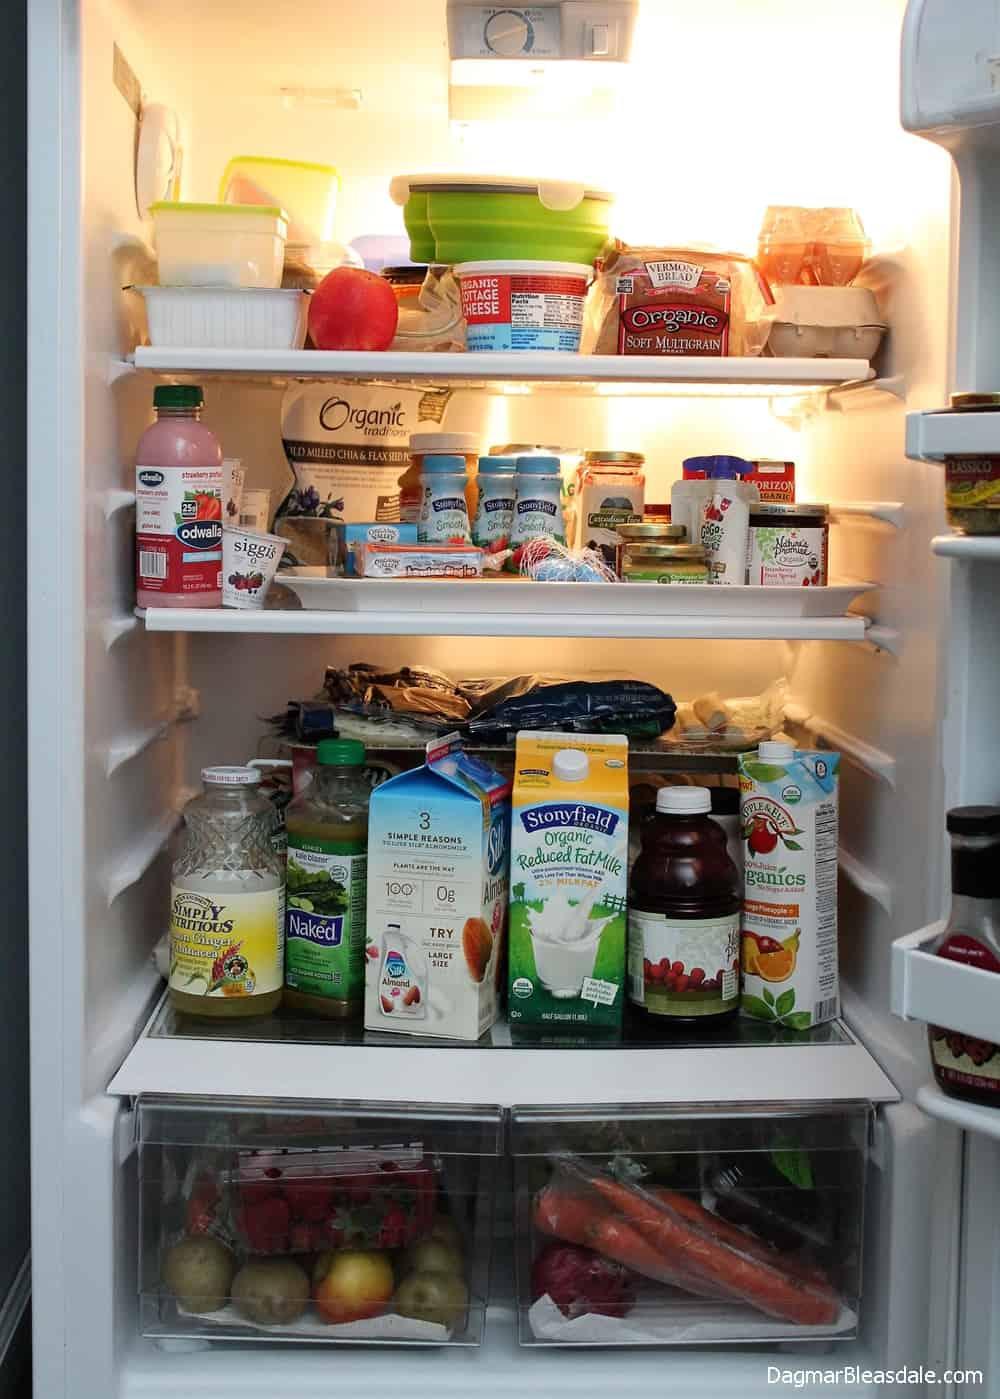 Refrigerator Organization Tips and Hacks, DagmarBleasdale.com